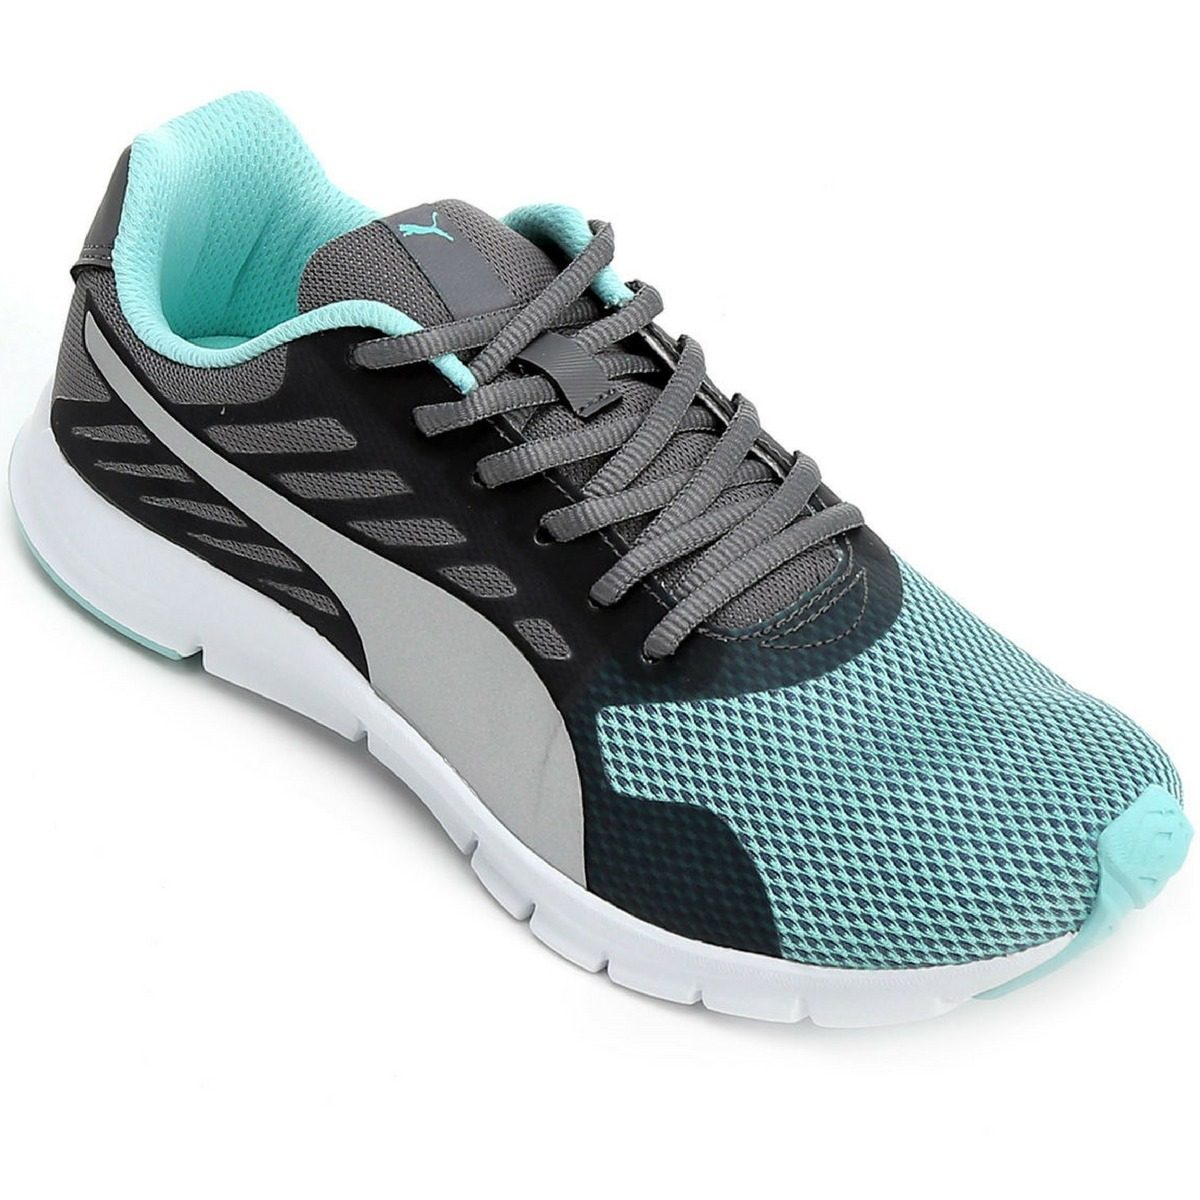 9cdefde1d2610 tênis puma feminino flexracer d bdp - azul claro/cinza. Carregando zoom.